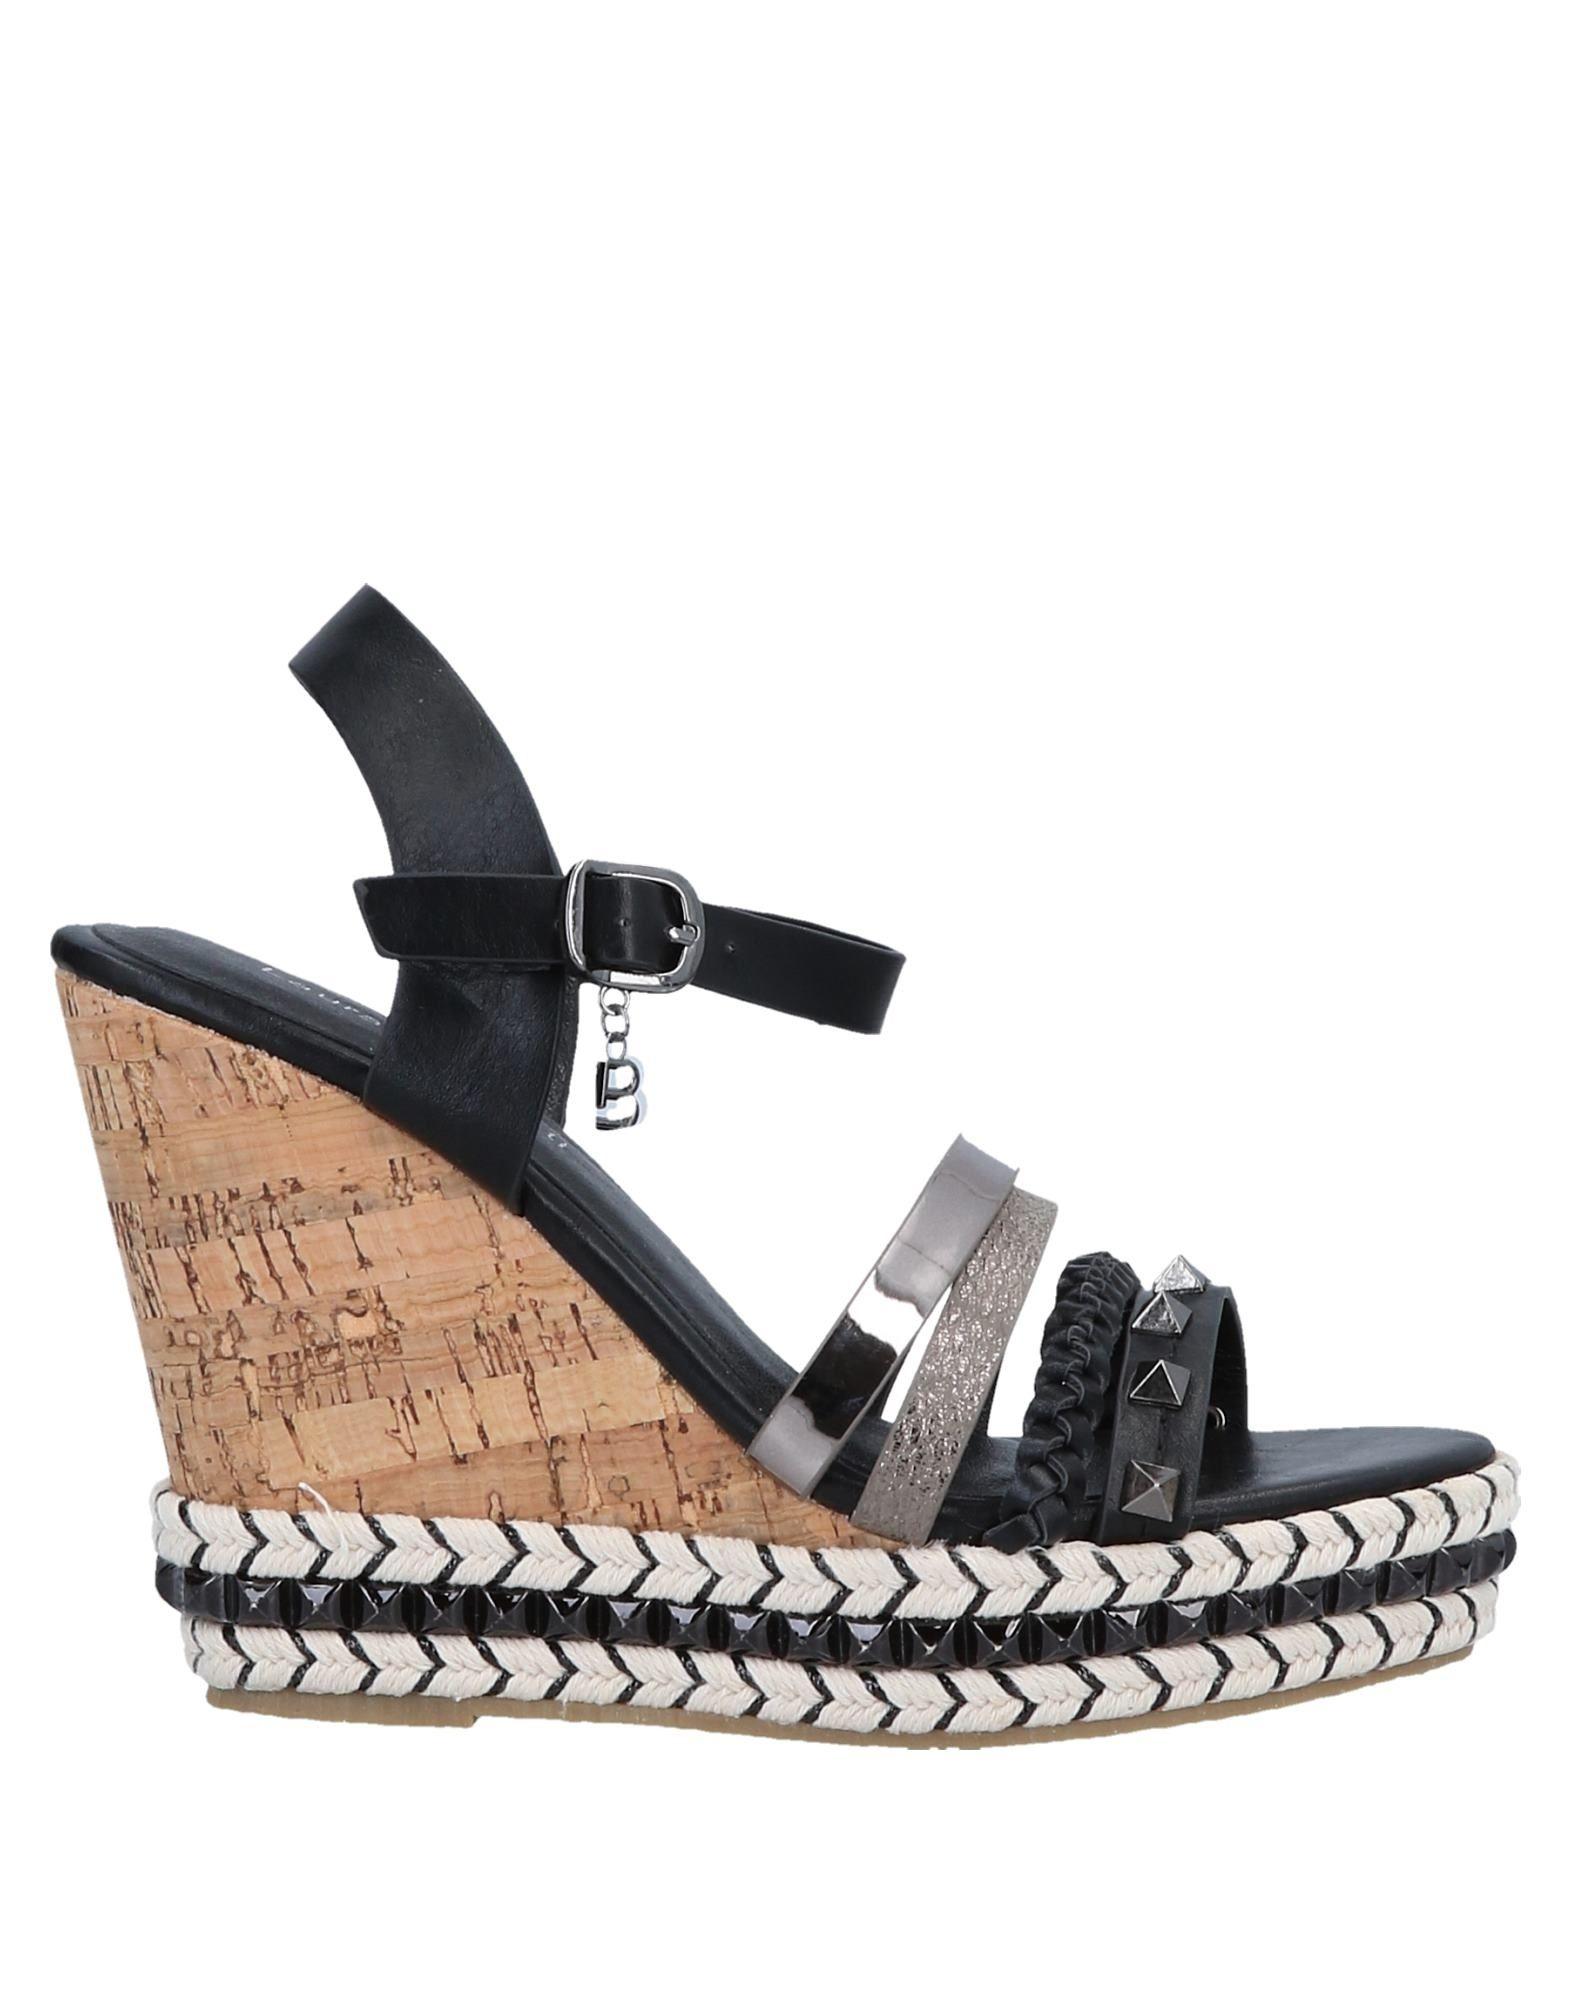 Laura Biagiotti Sandalen Damen 11565451LE Gute Qualität beliebte Schuhe